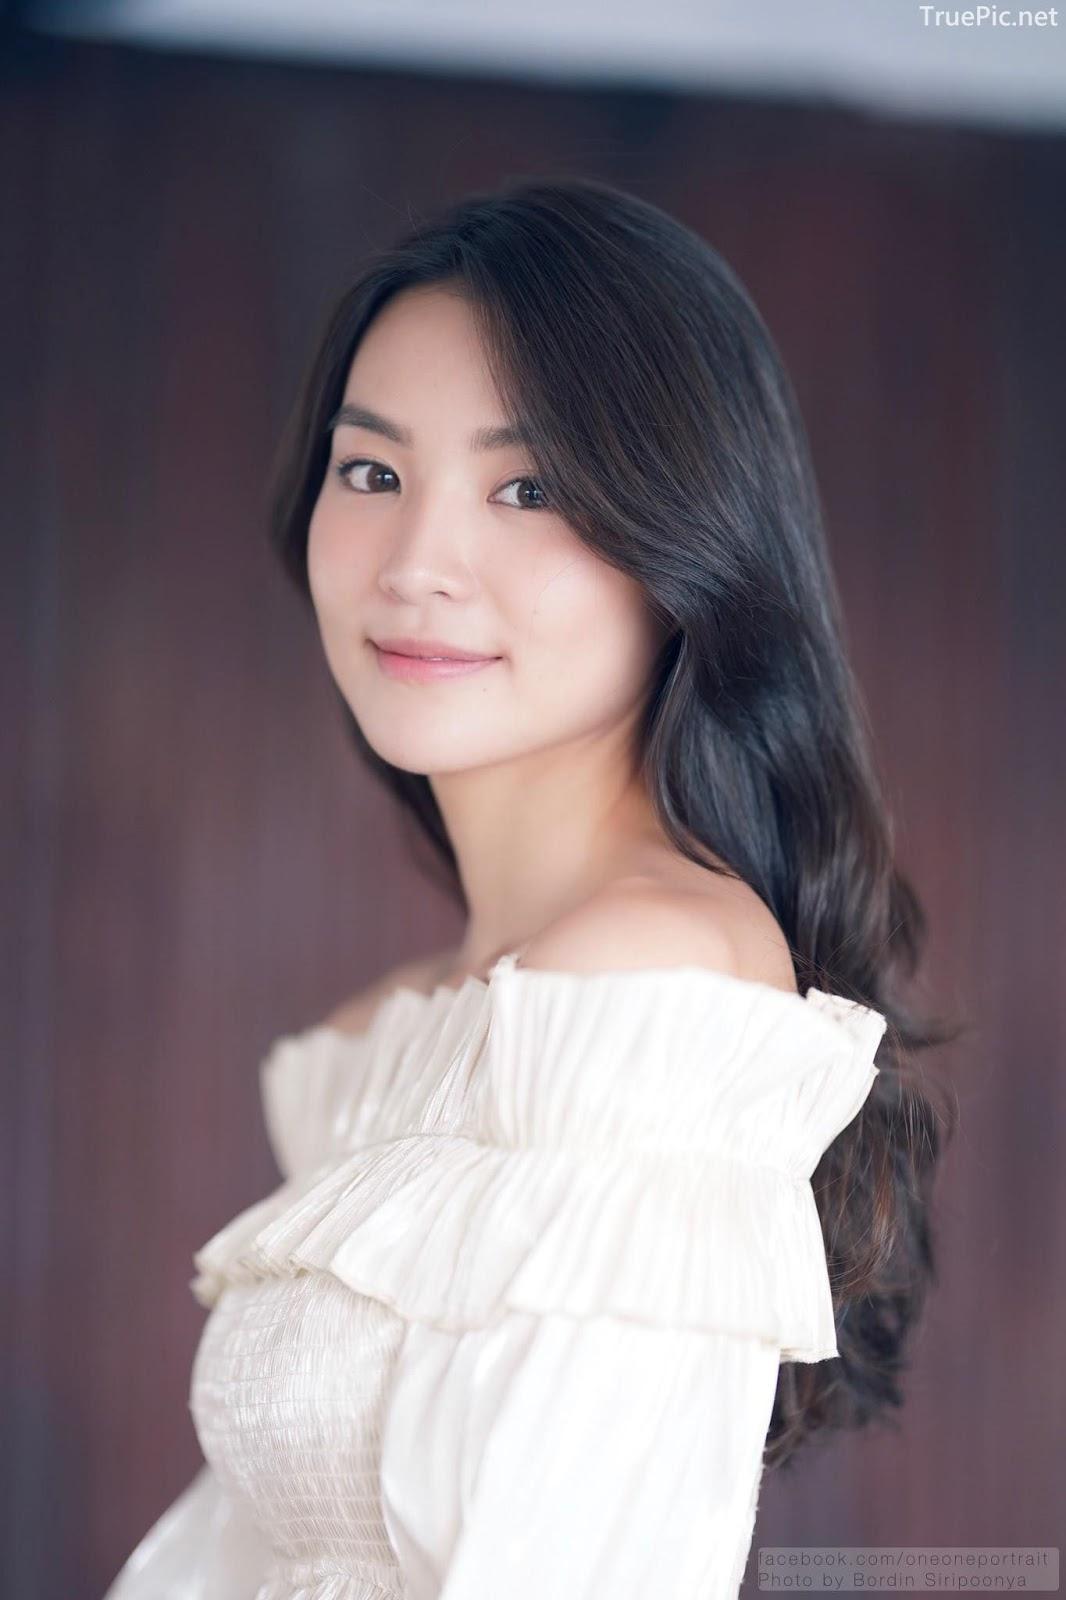 Beauty Thailand Kapook Phatchara vs Photo album Love you 3000 - Picture 3